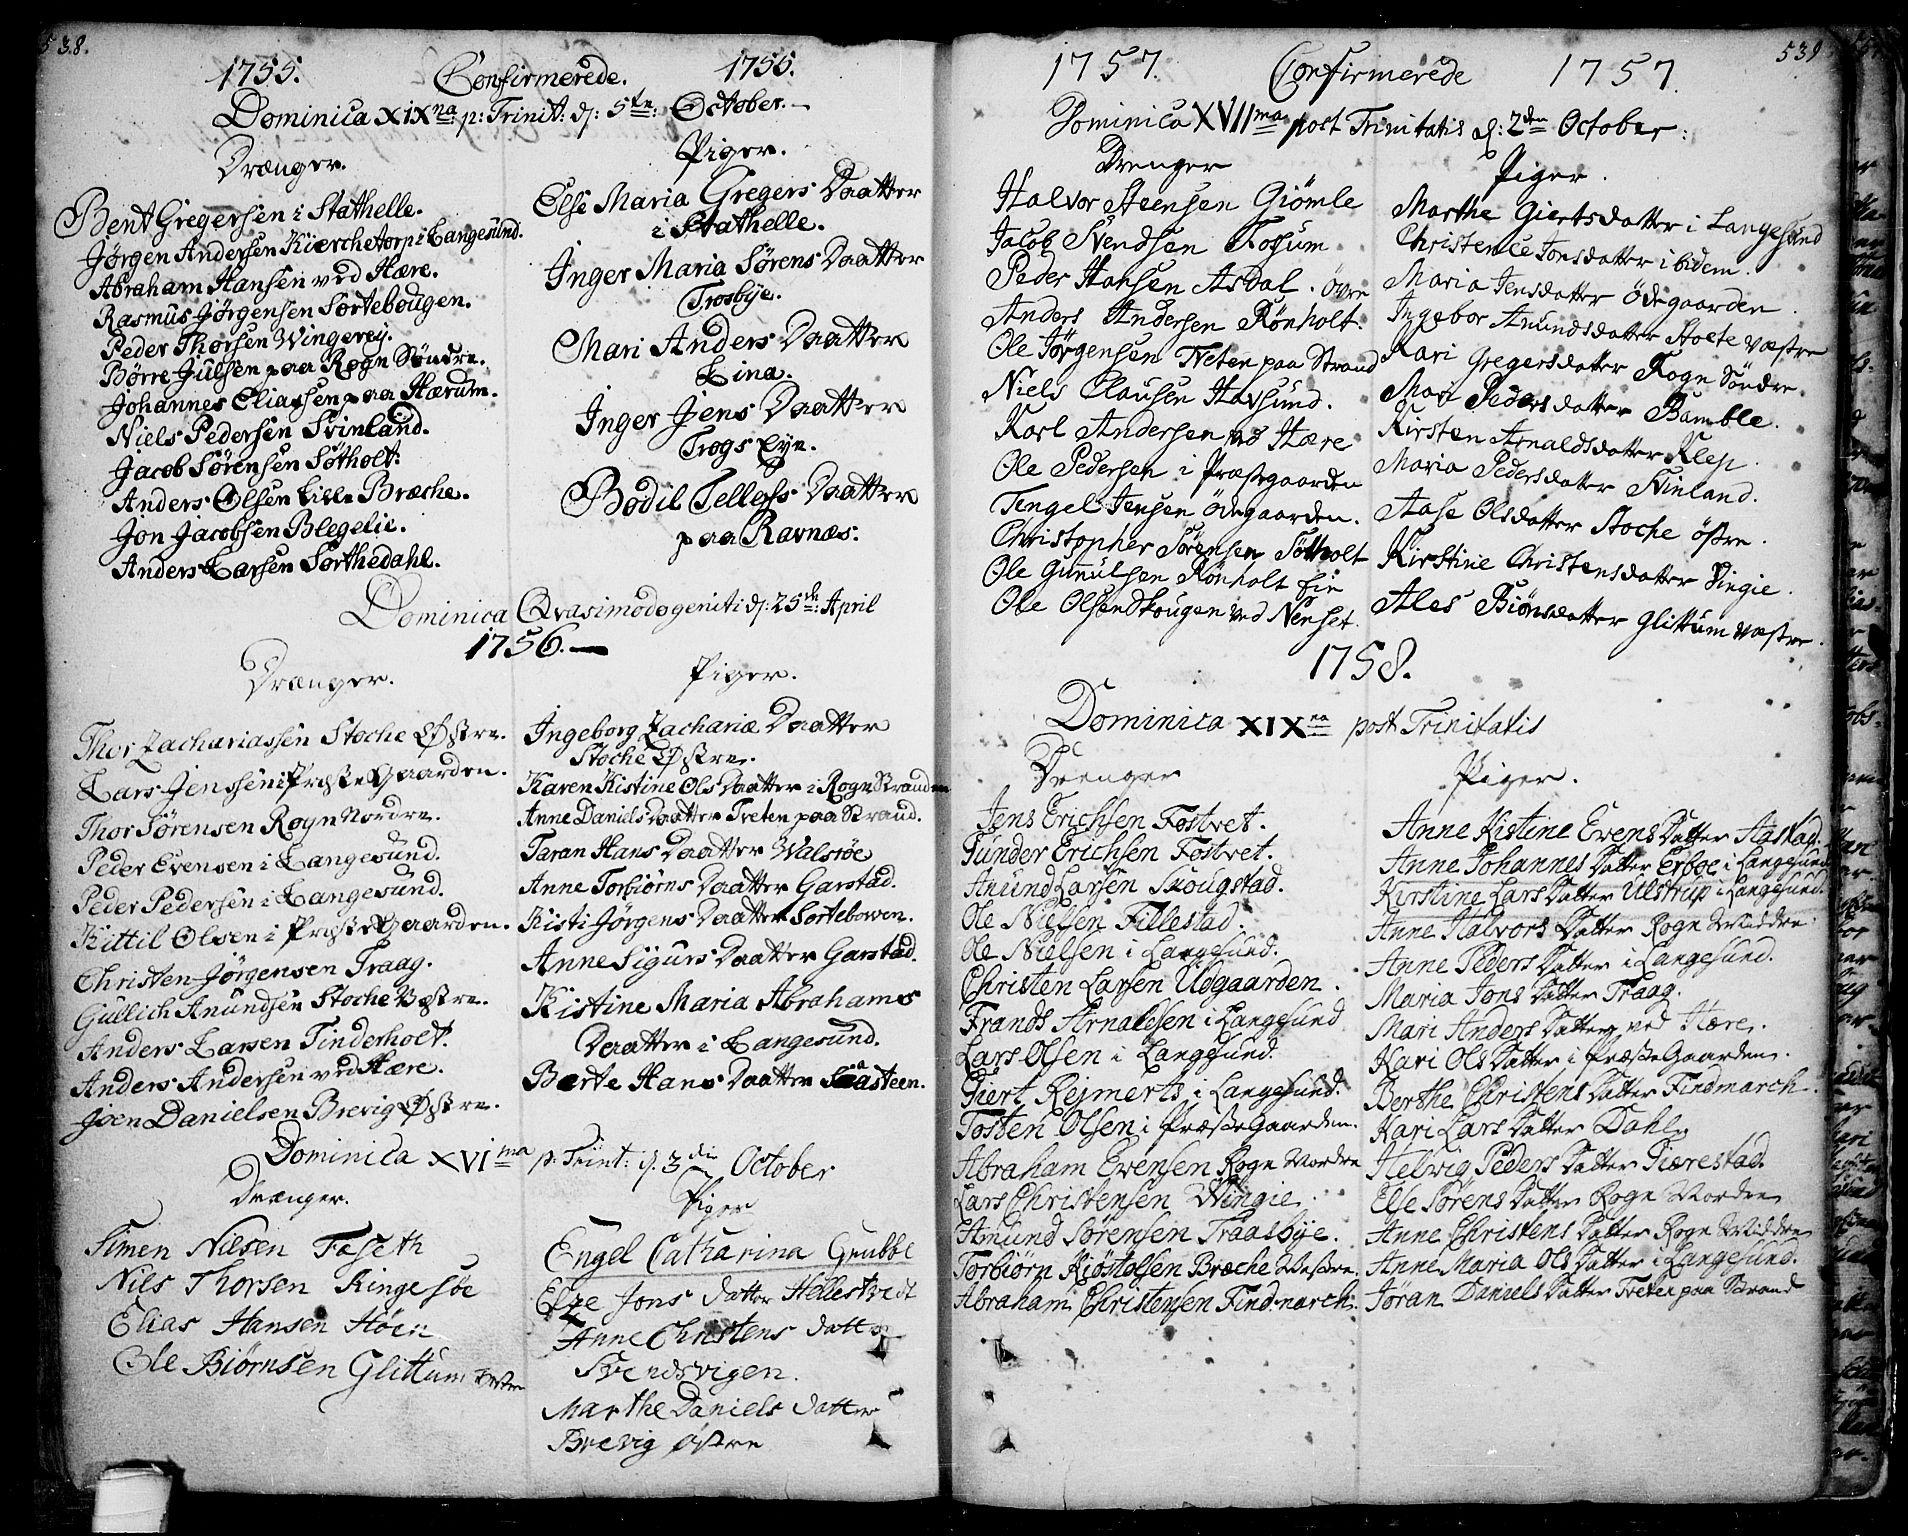 SAKO, Bamble kirkebøker, F/Fa/L0001: Ministerialbok nr. I 1, 1702-1774, s. 538-539